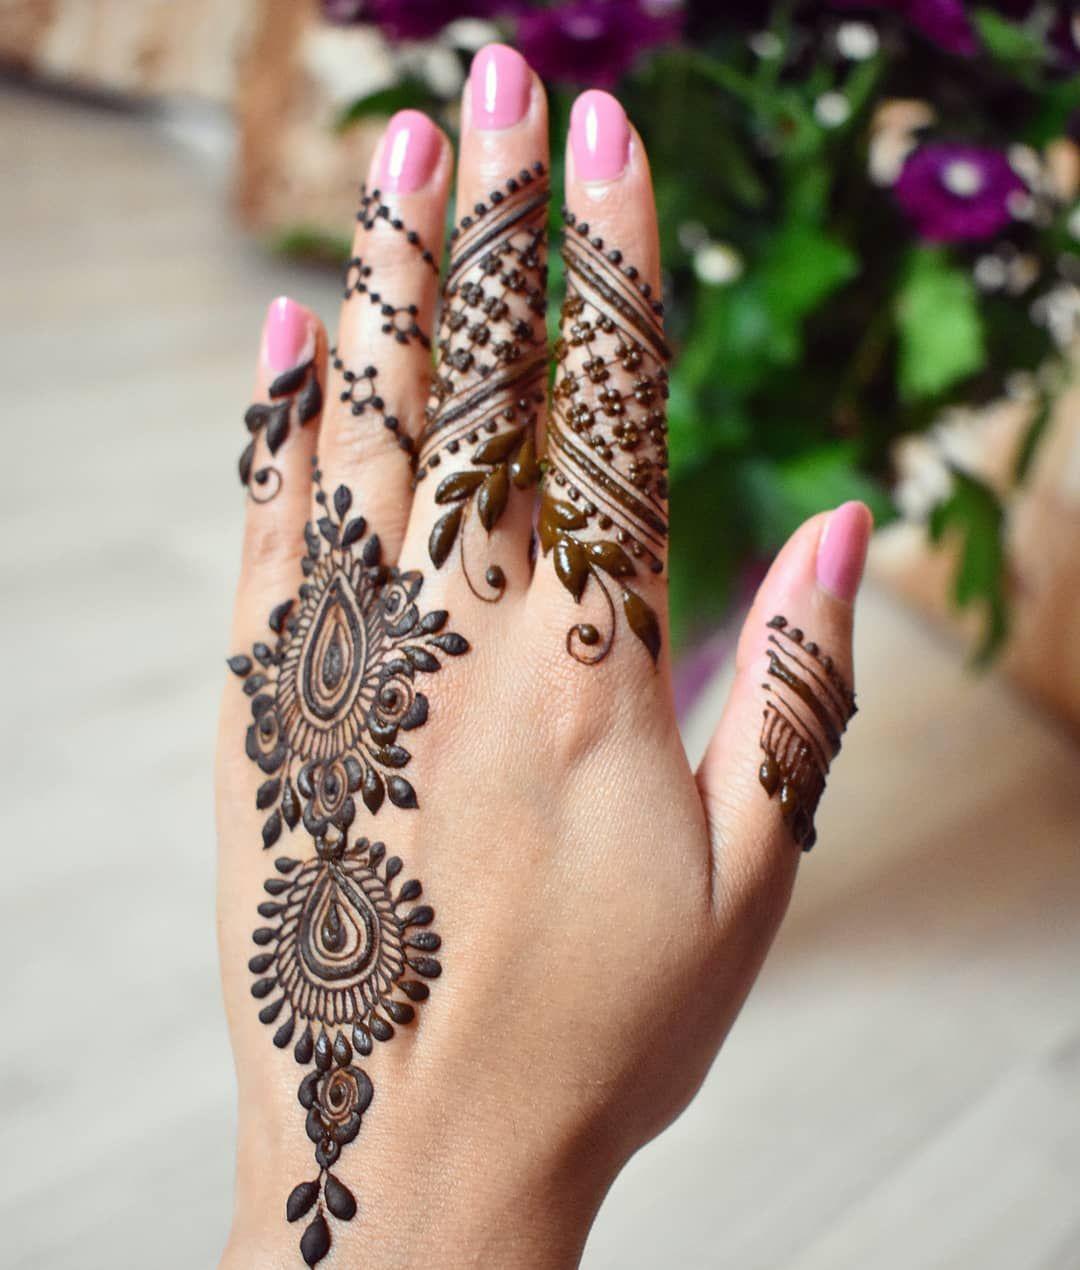 Henna Art By Aroosa On Instagram Simple And Sweet Design Inspired By Henna Nurahshenna